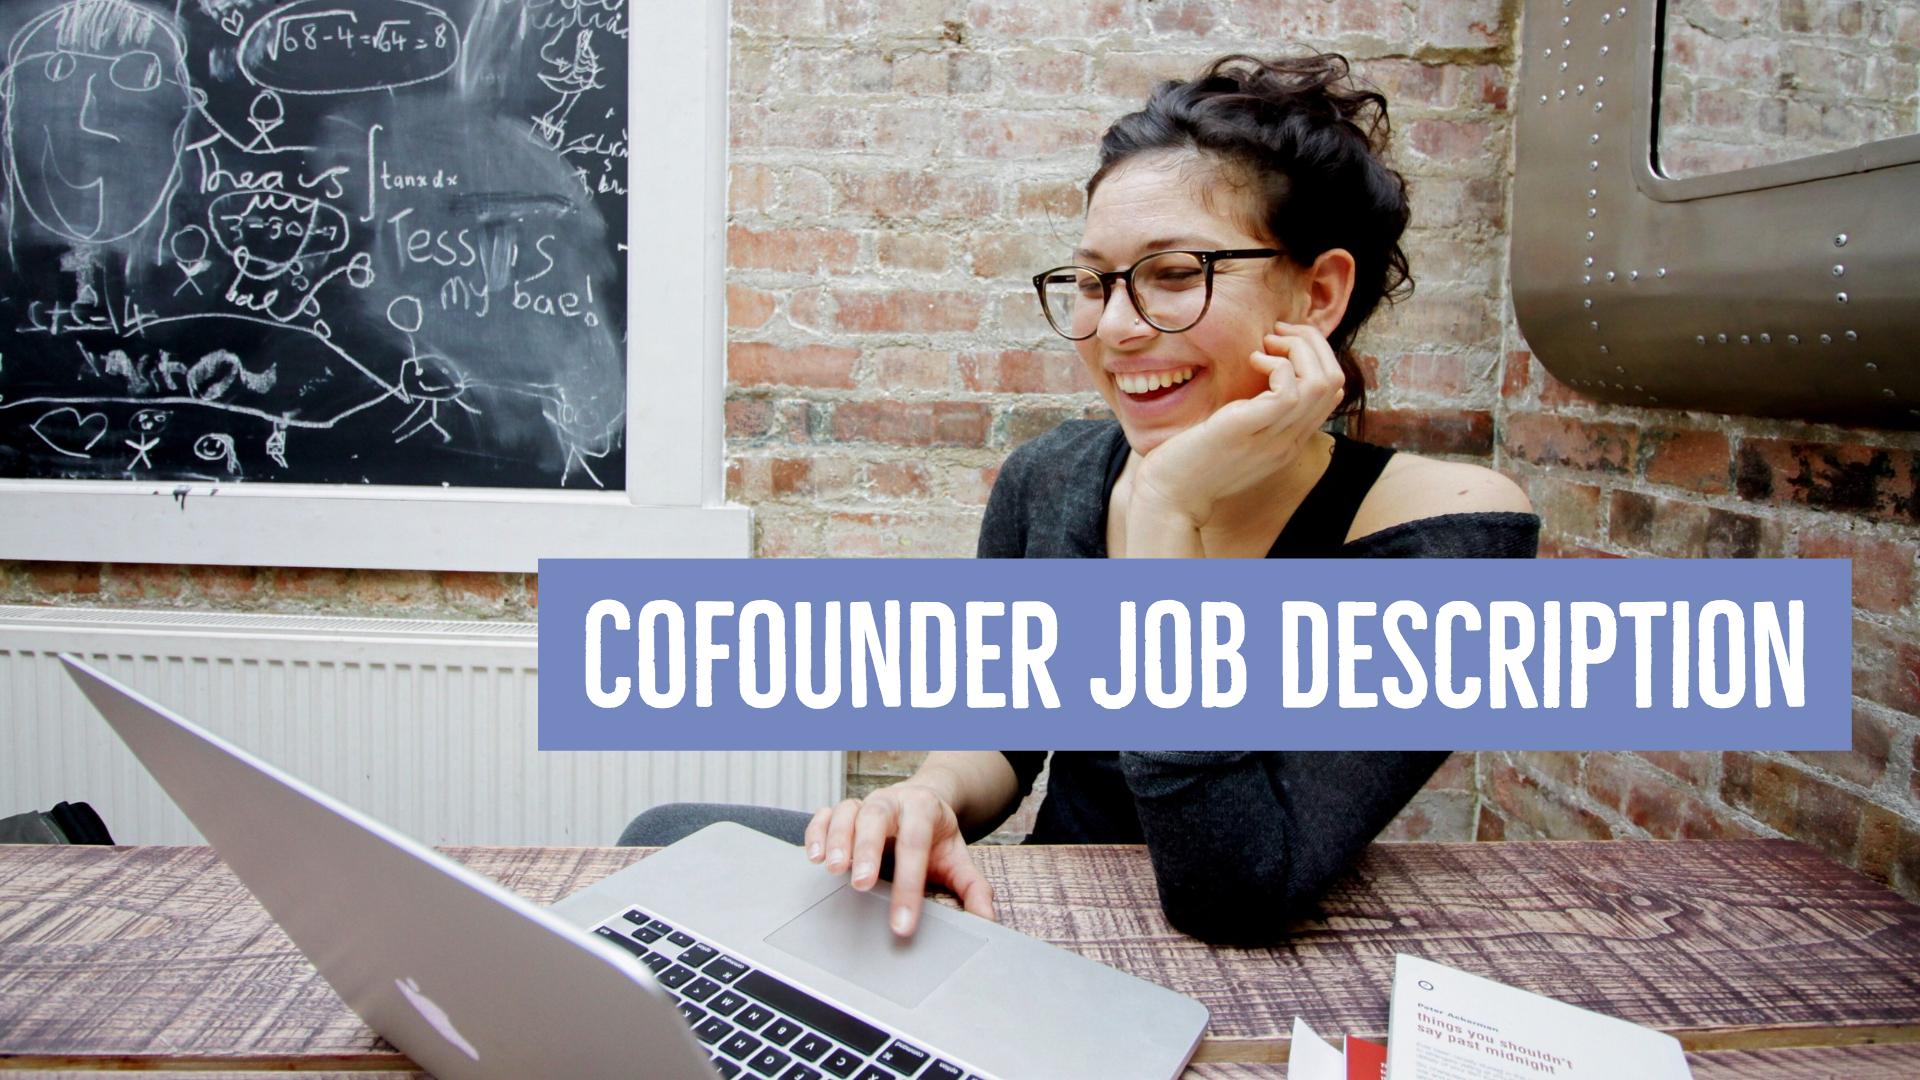 Cofounder Job Description